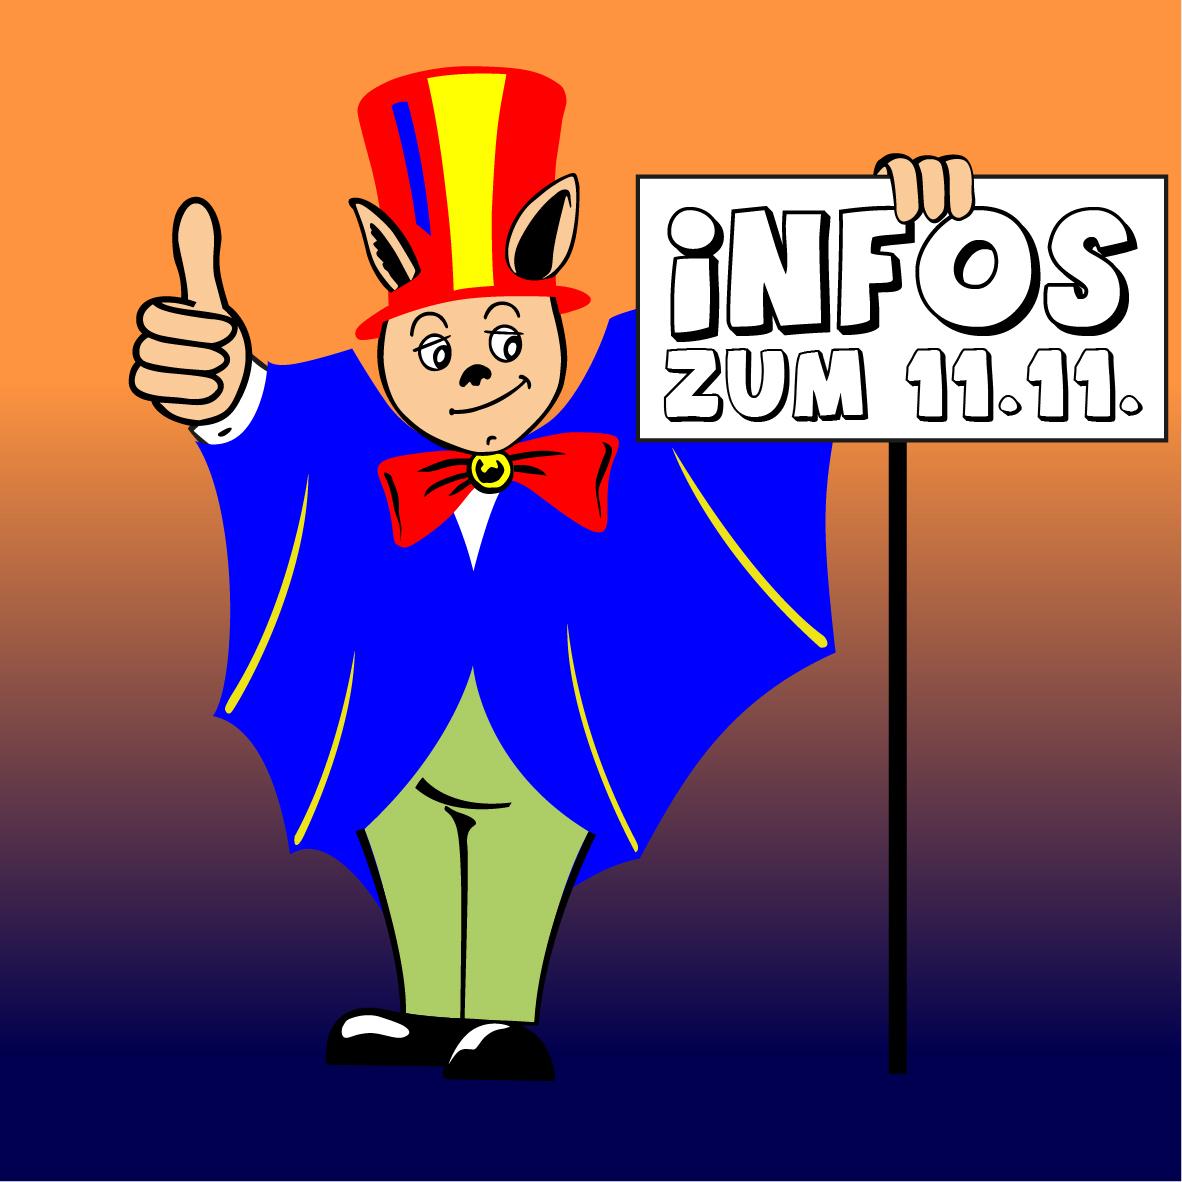 You are currently viewing Infos zum Elften im Elften